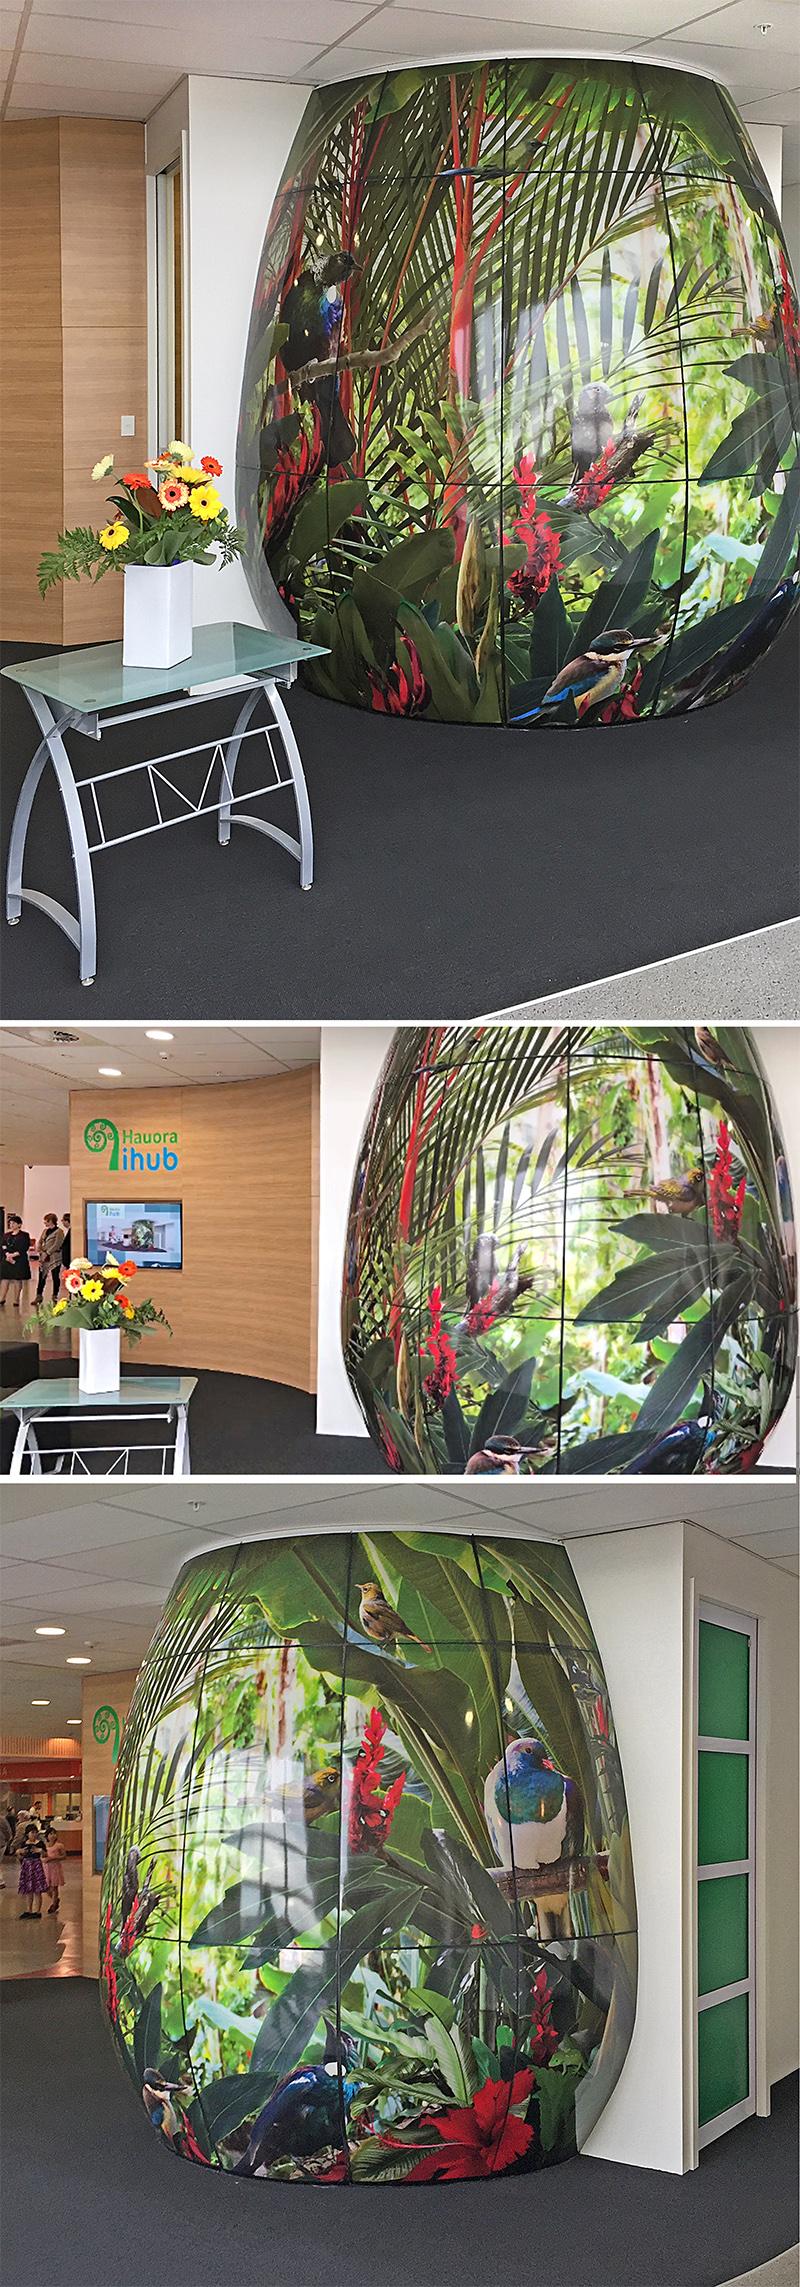 waikato-dhb-nz-birds-and-tropical-plants-acrylic-pod-wall-mural-artist.jpg